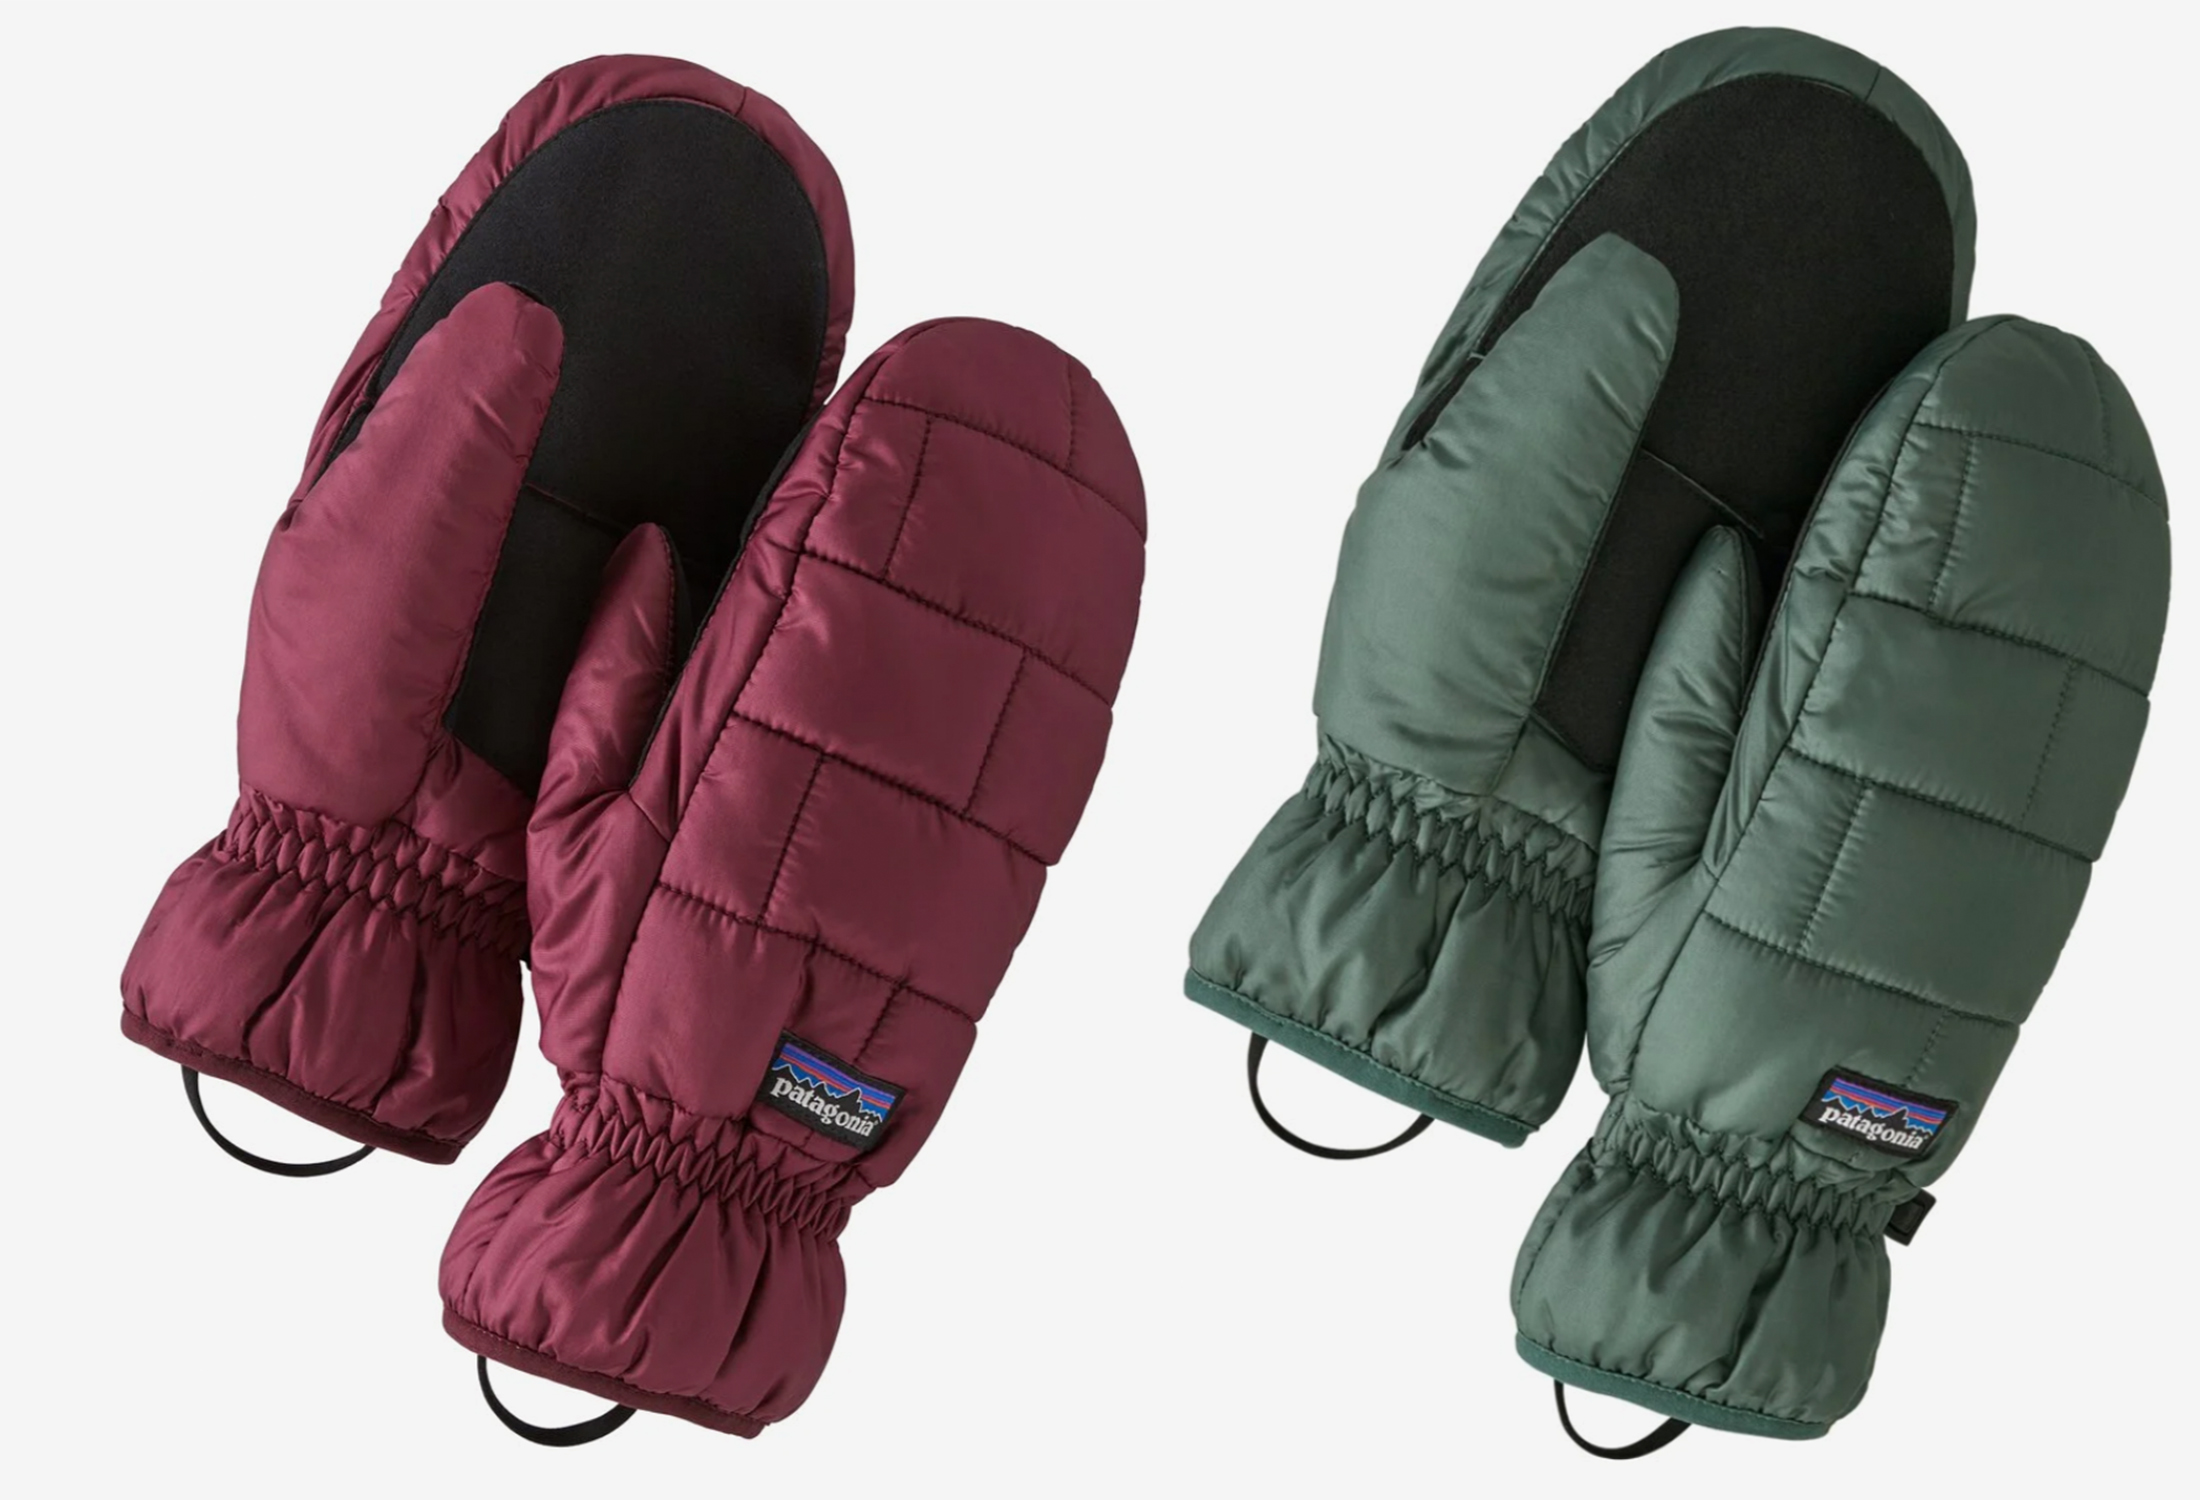 patagonia nano puff mitts